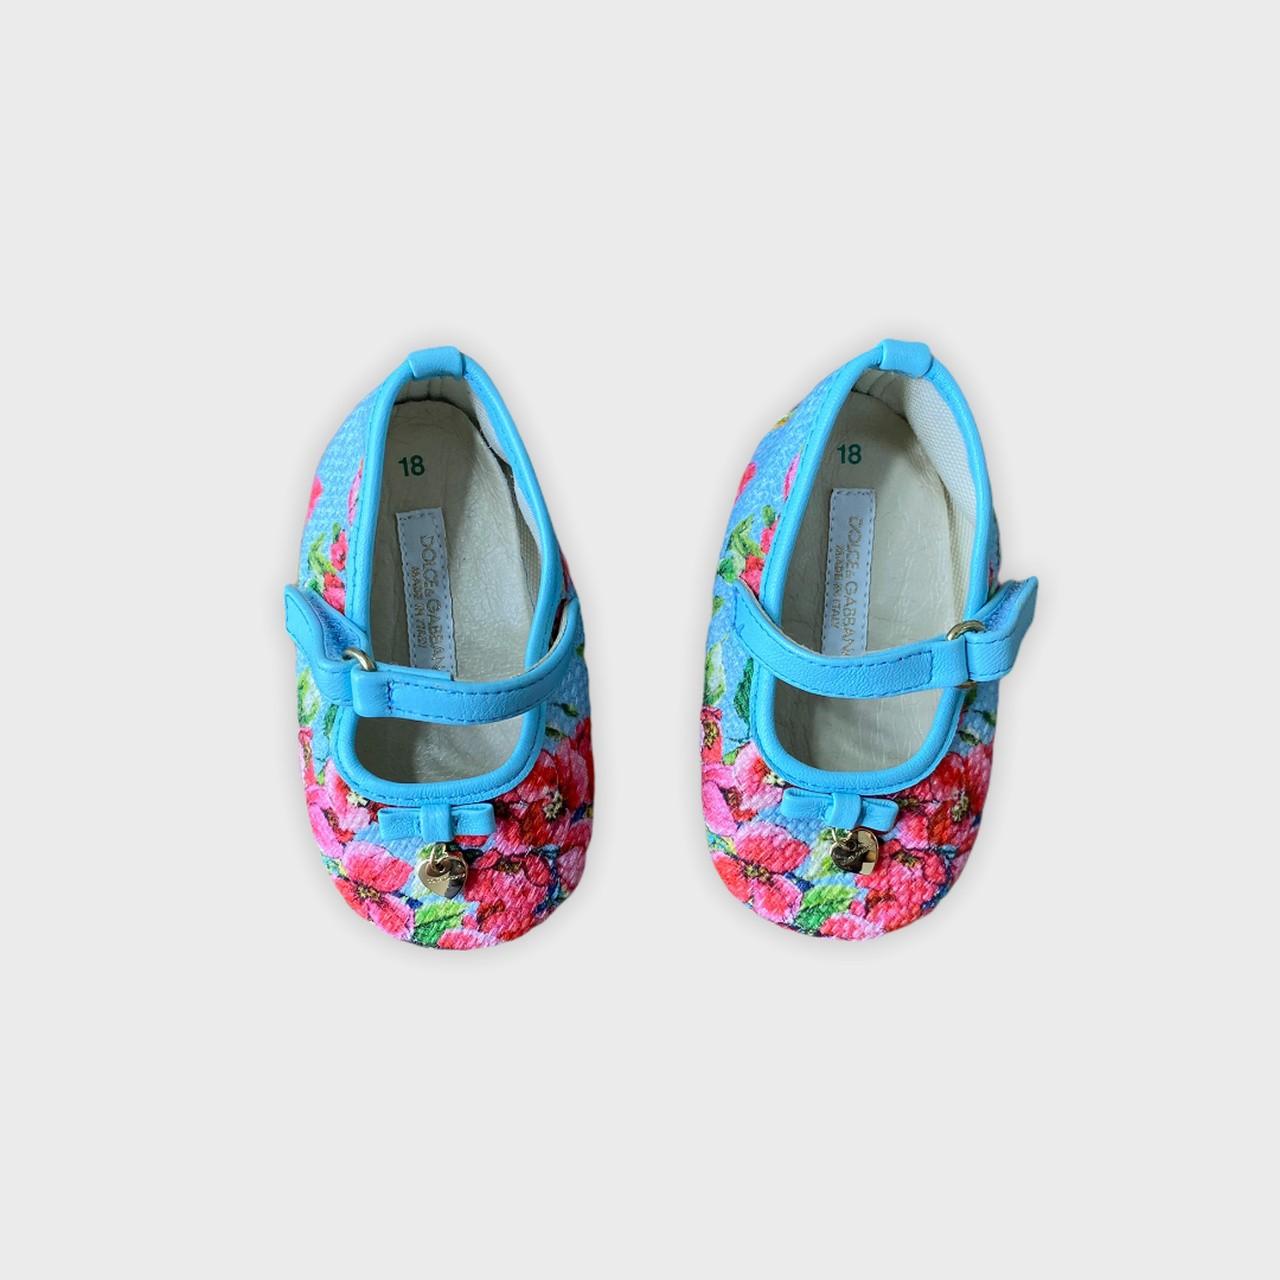 Sapatilha Dolce&Gabbana Tam. 17BR / 18EUR